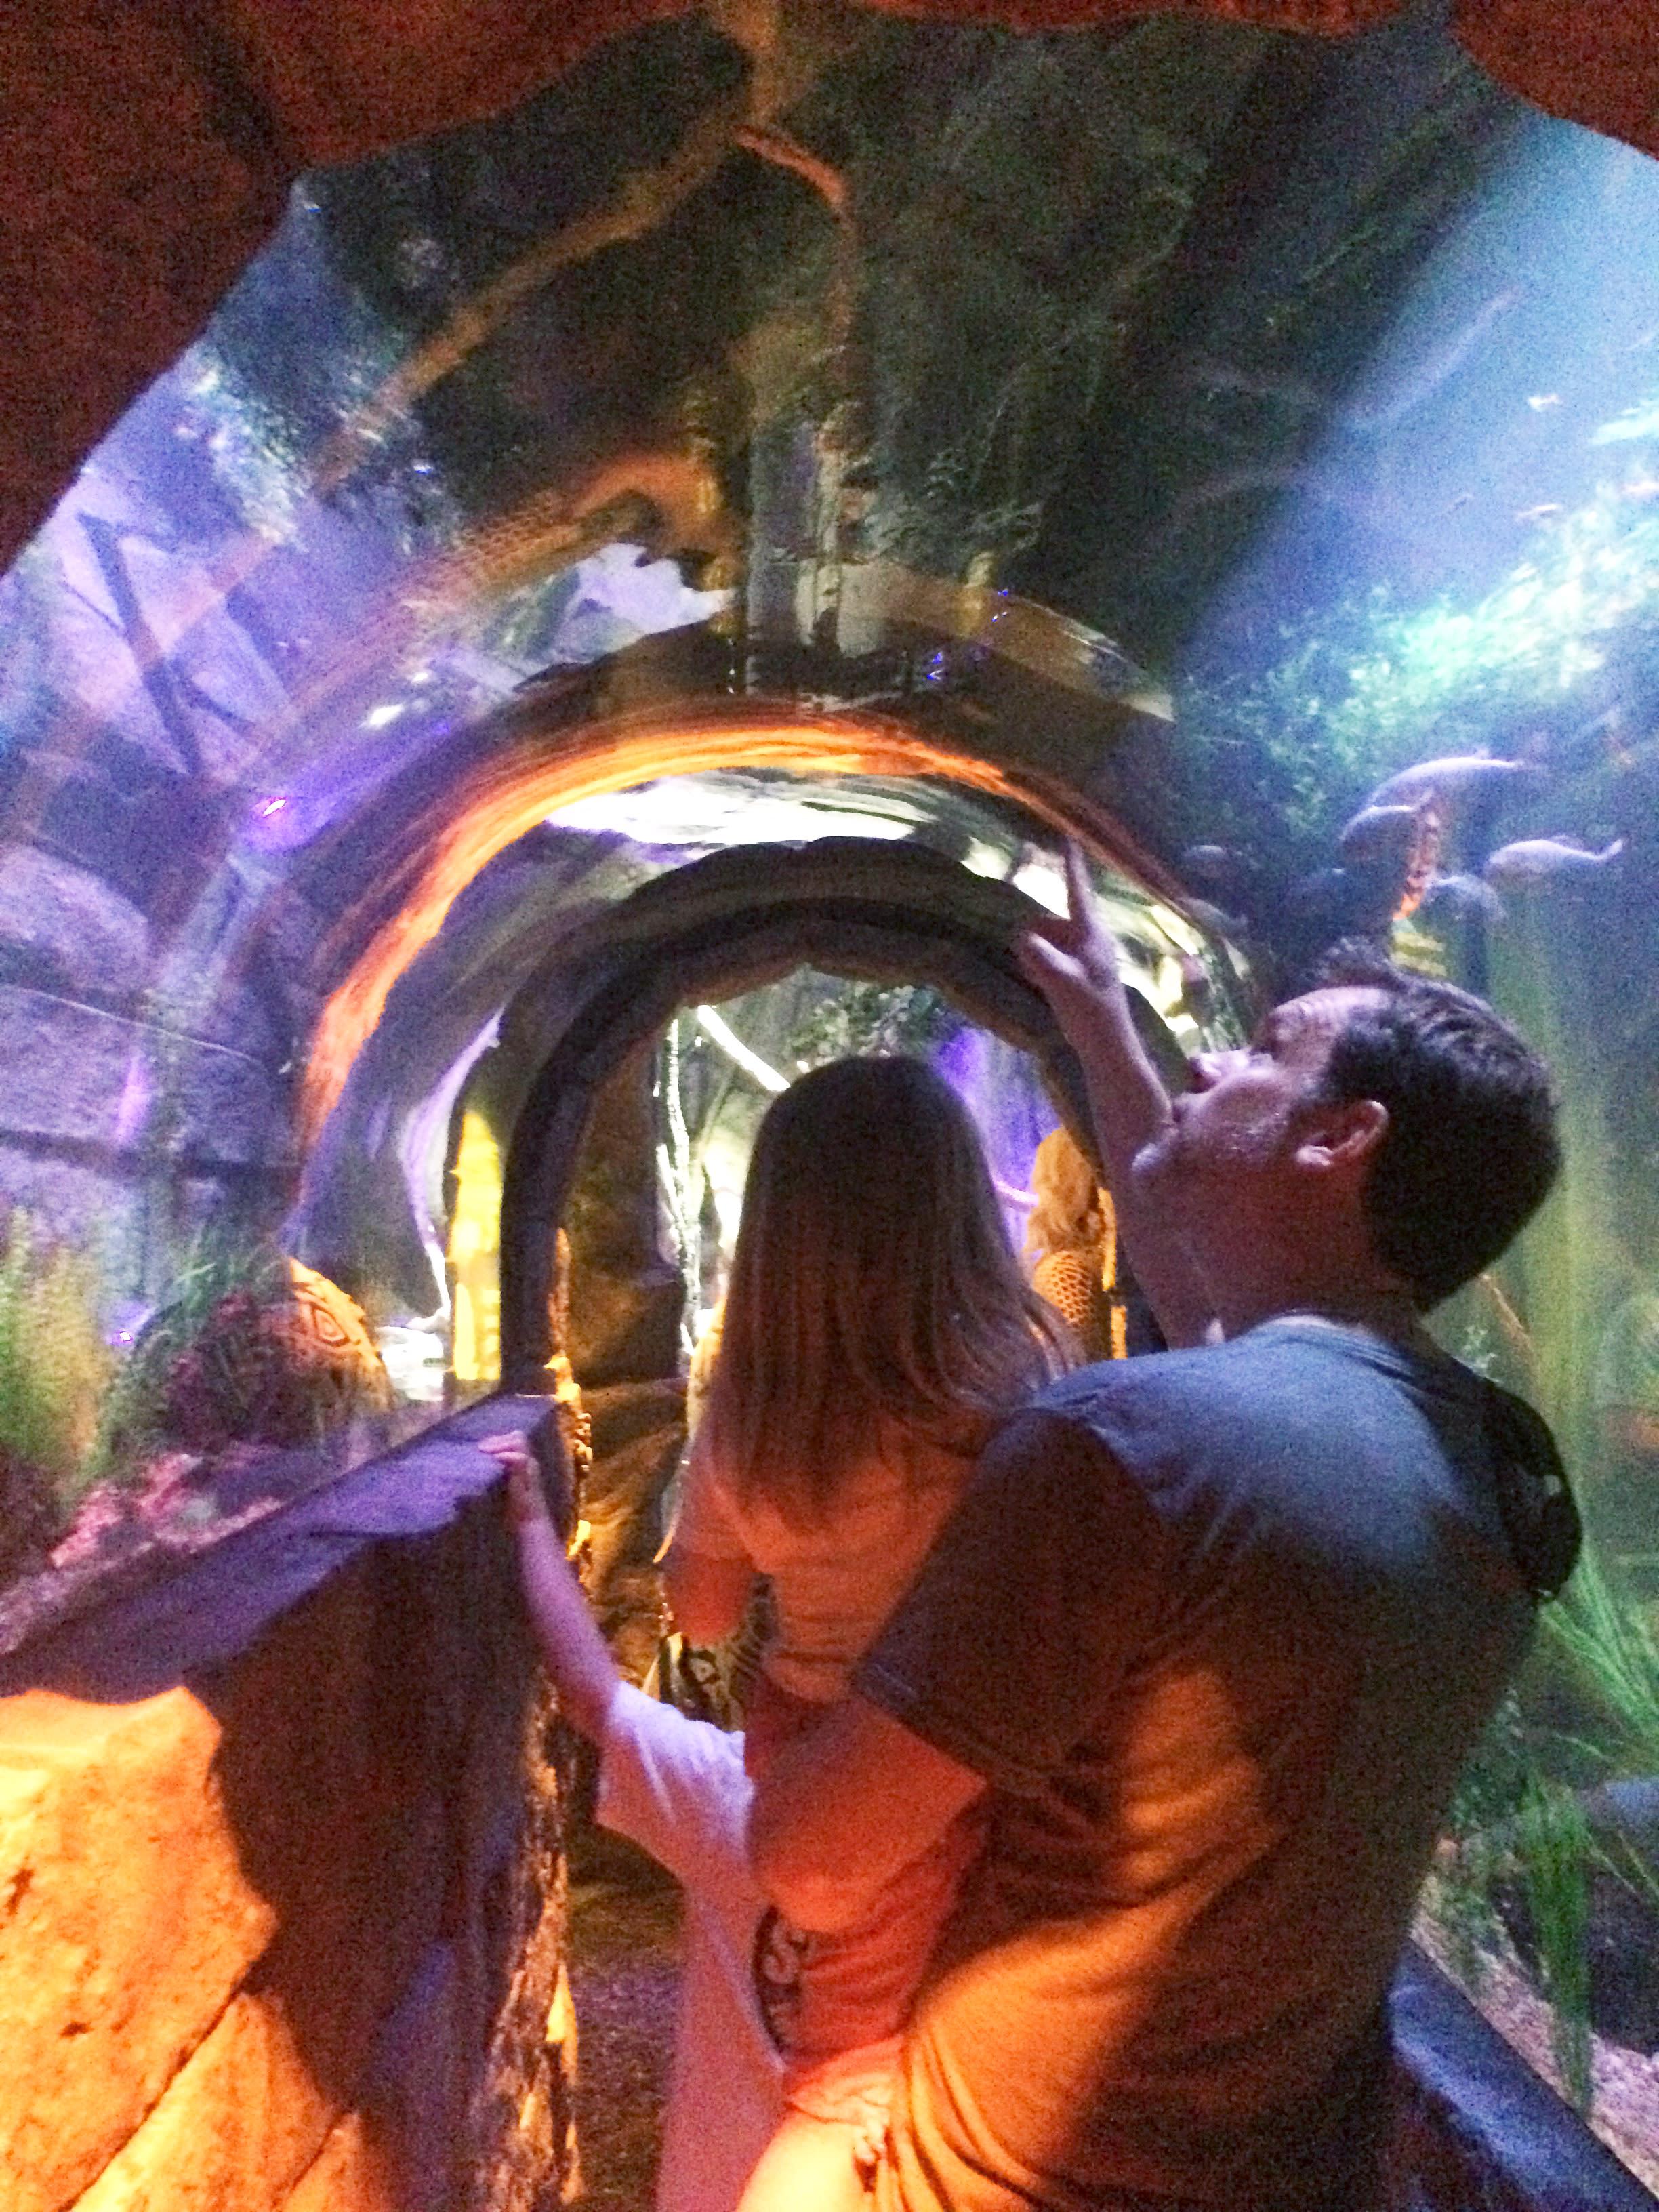 the 8 ft. long piranha tunnel